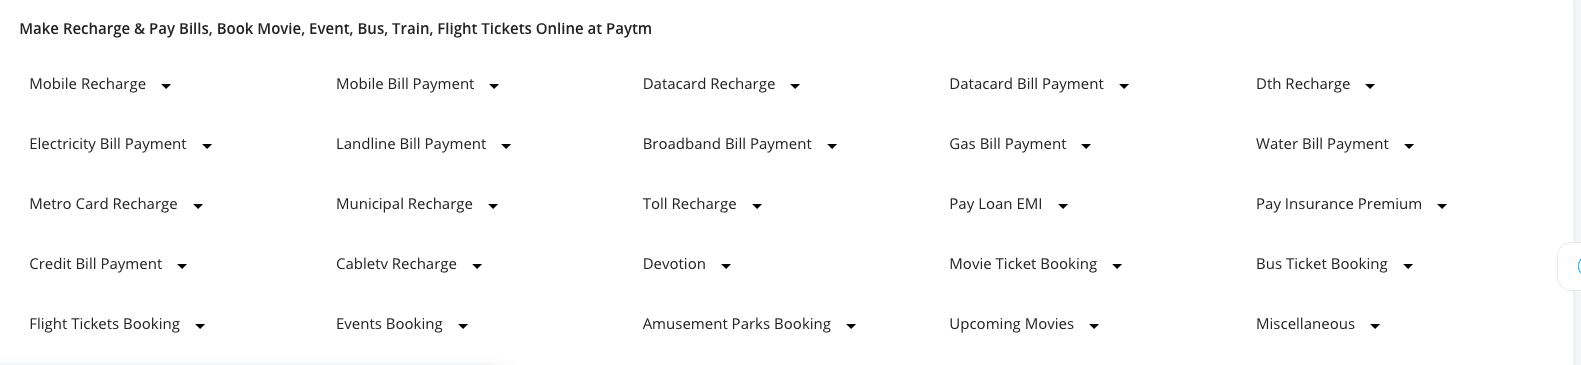 billpayments-how-paytm-earns